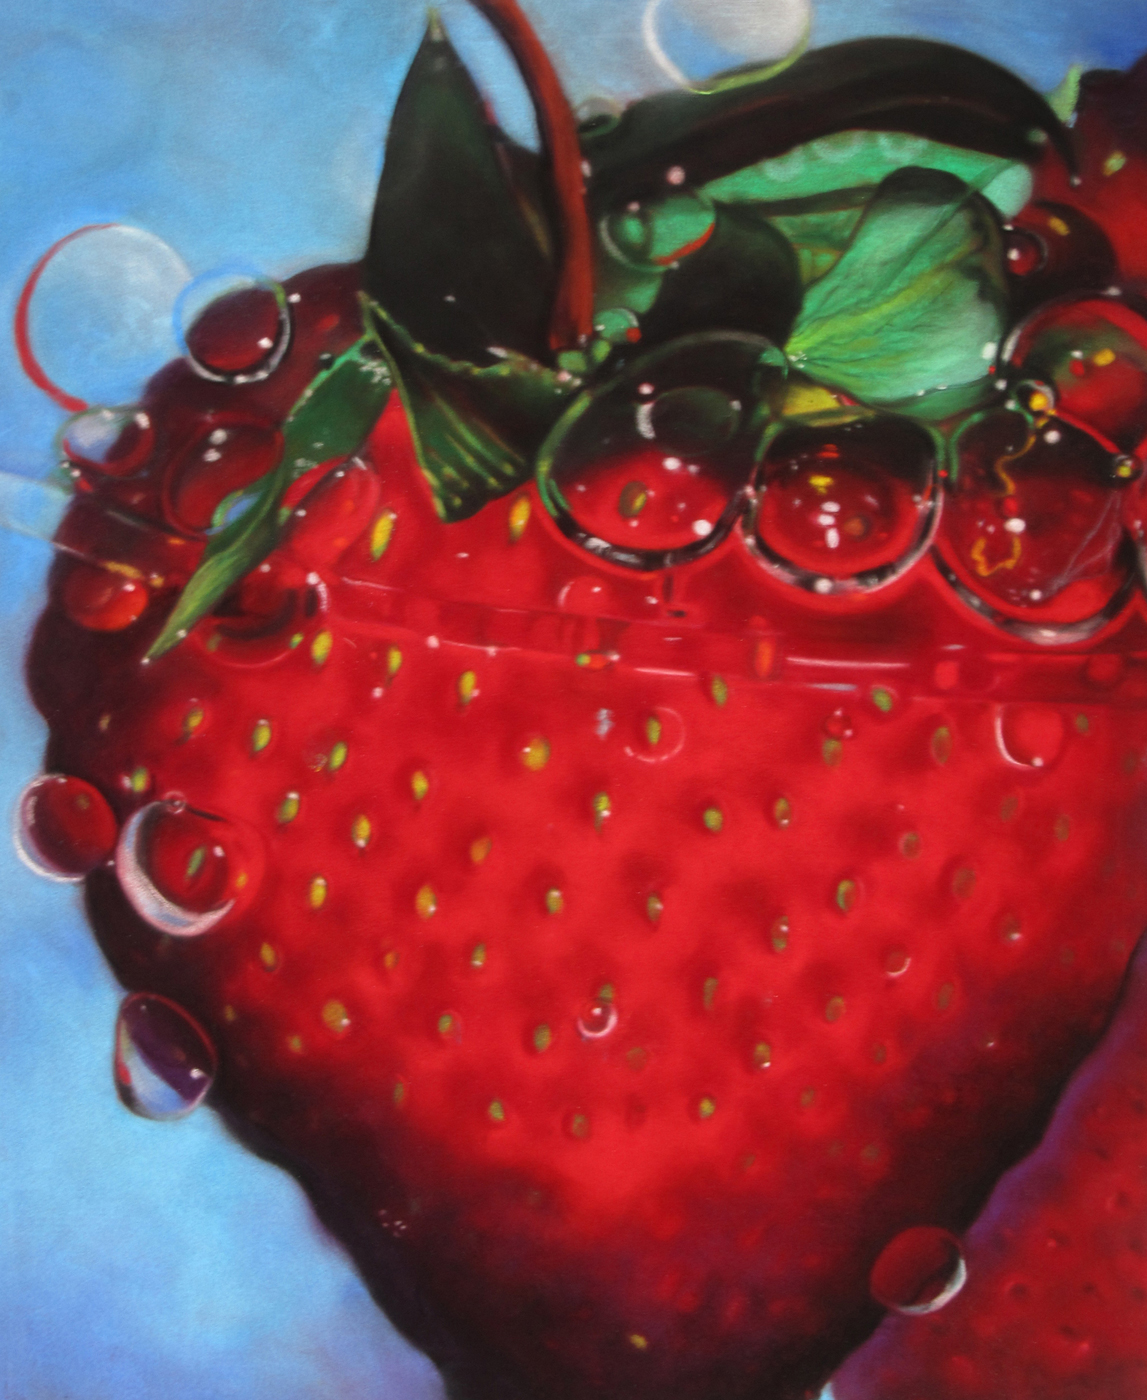 Barbara Mason, Hon. Mention, Juicy, pastel